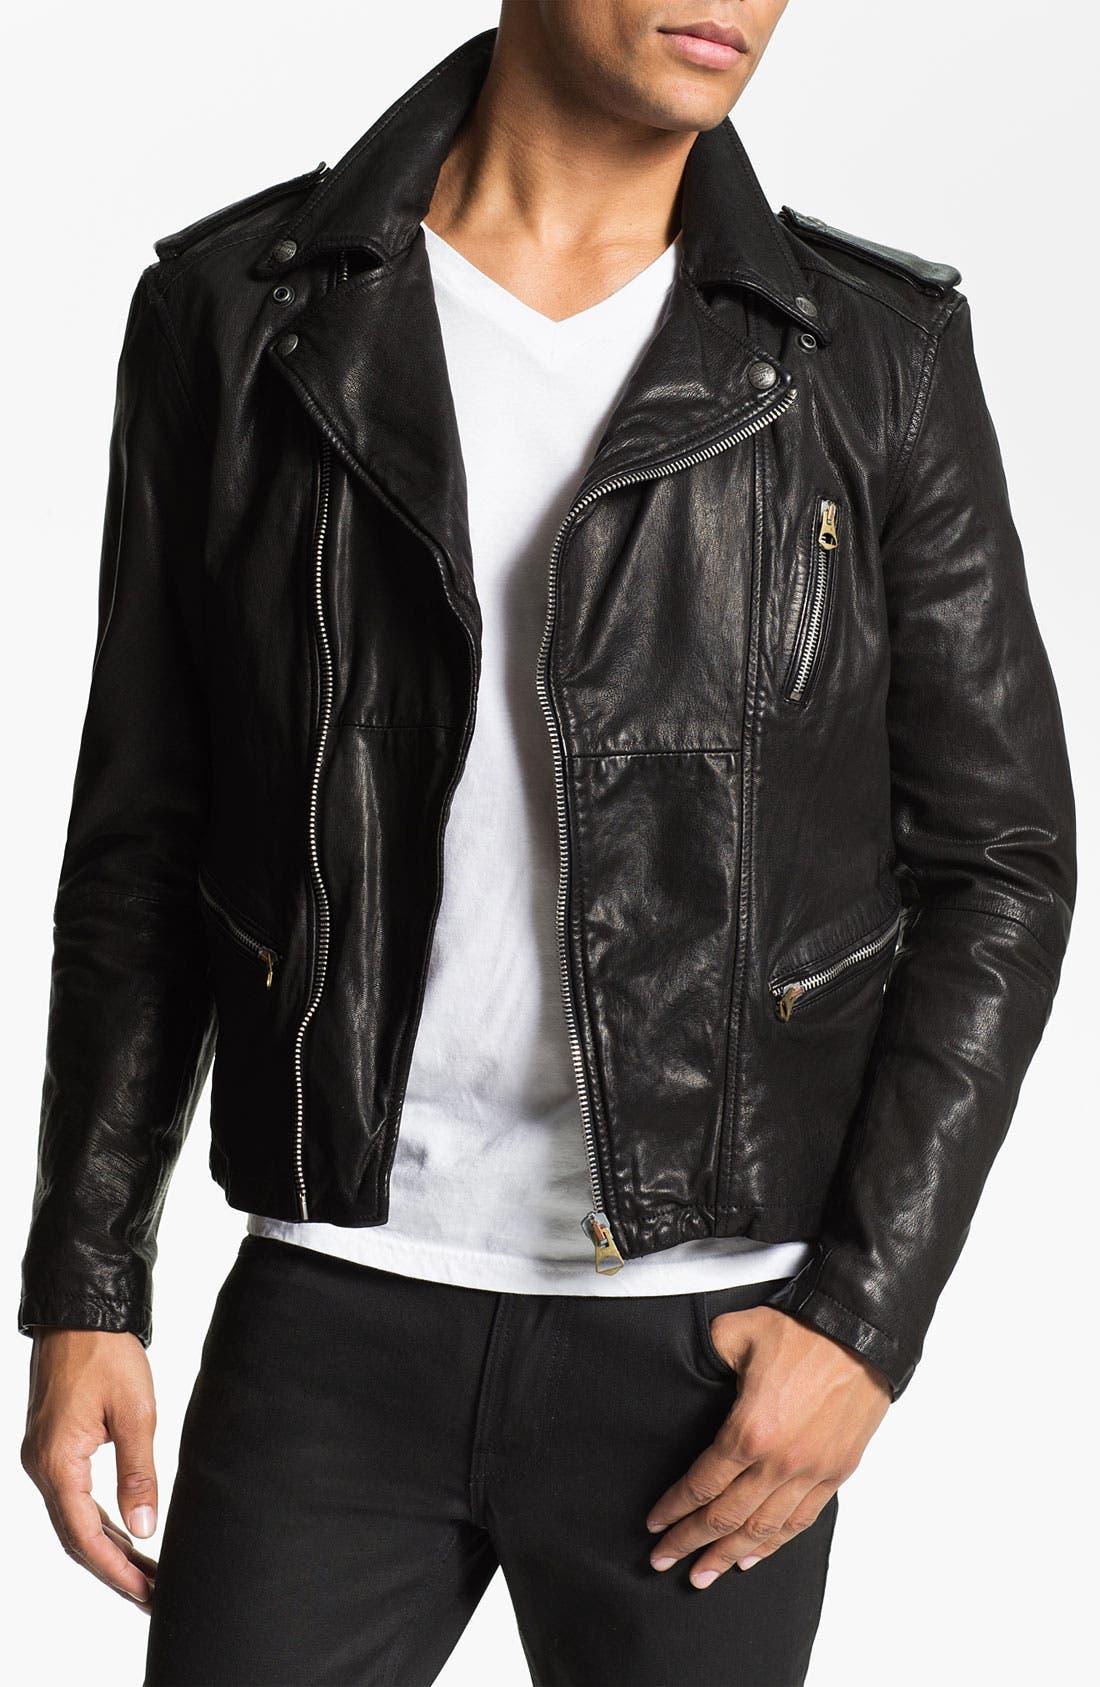 Main Image - Scotch & Soda 'Rocker' Leather Jacket